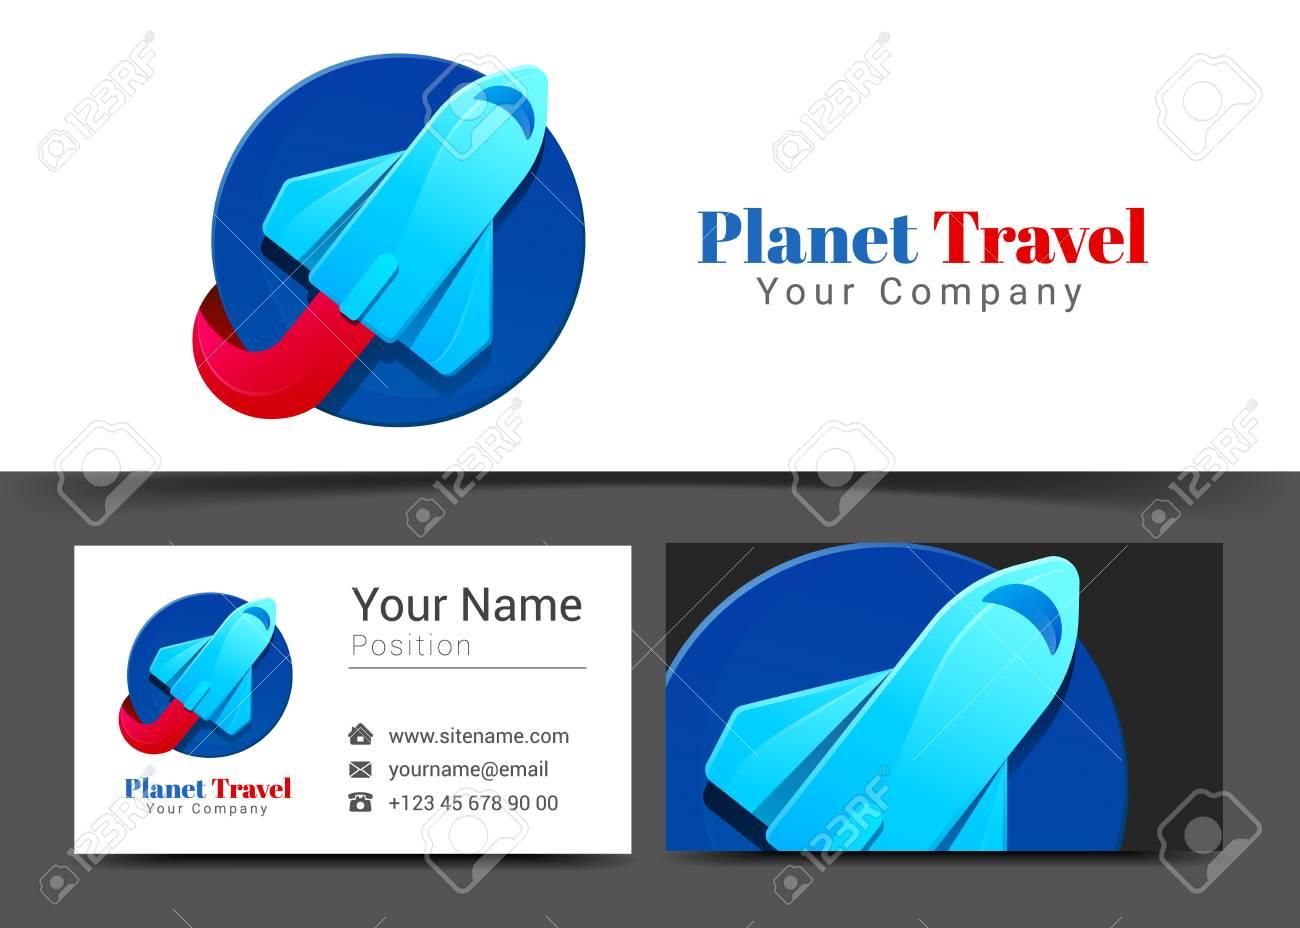 Logo Dentreprise De Tourisme Bleu Avion Et Modele